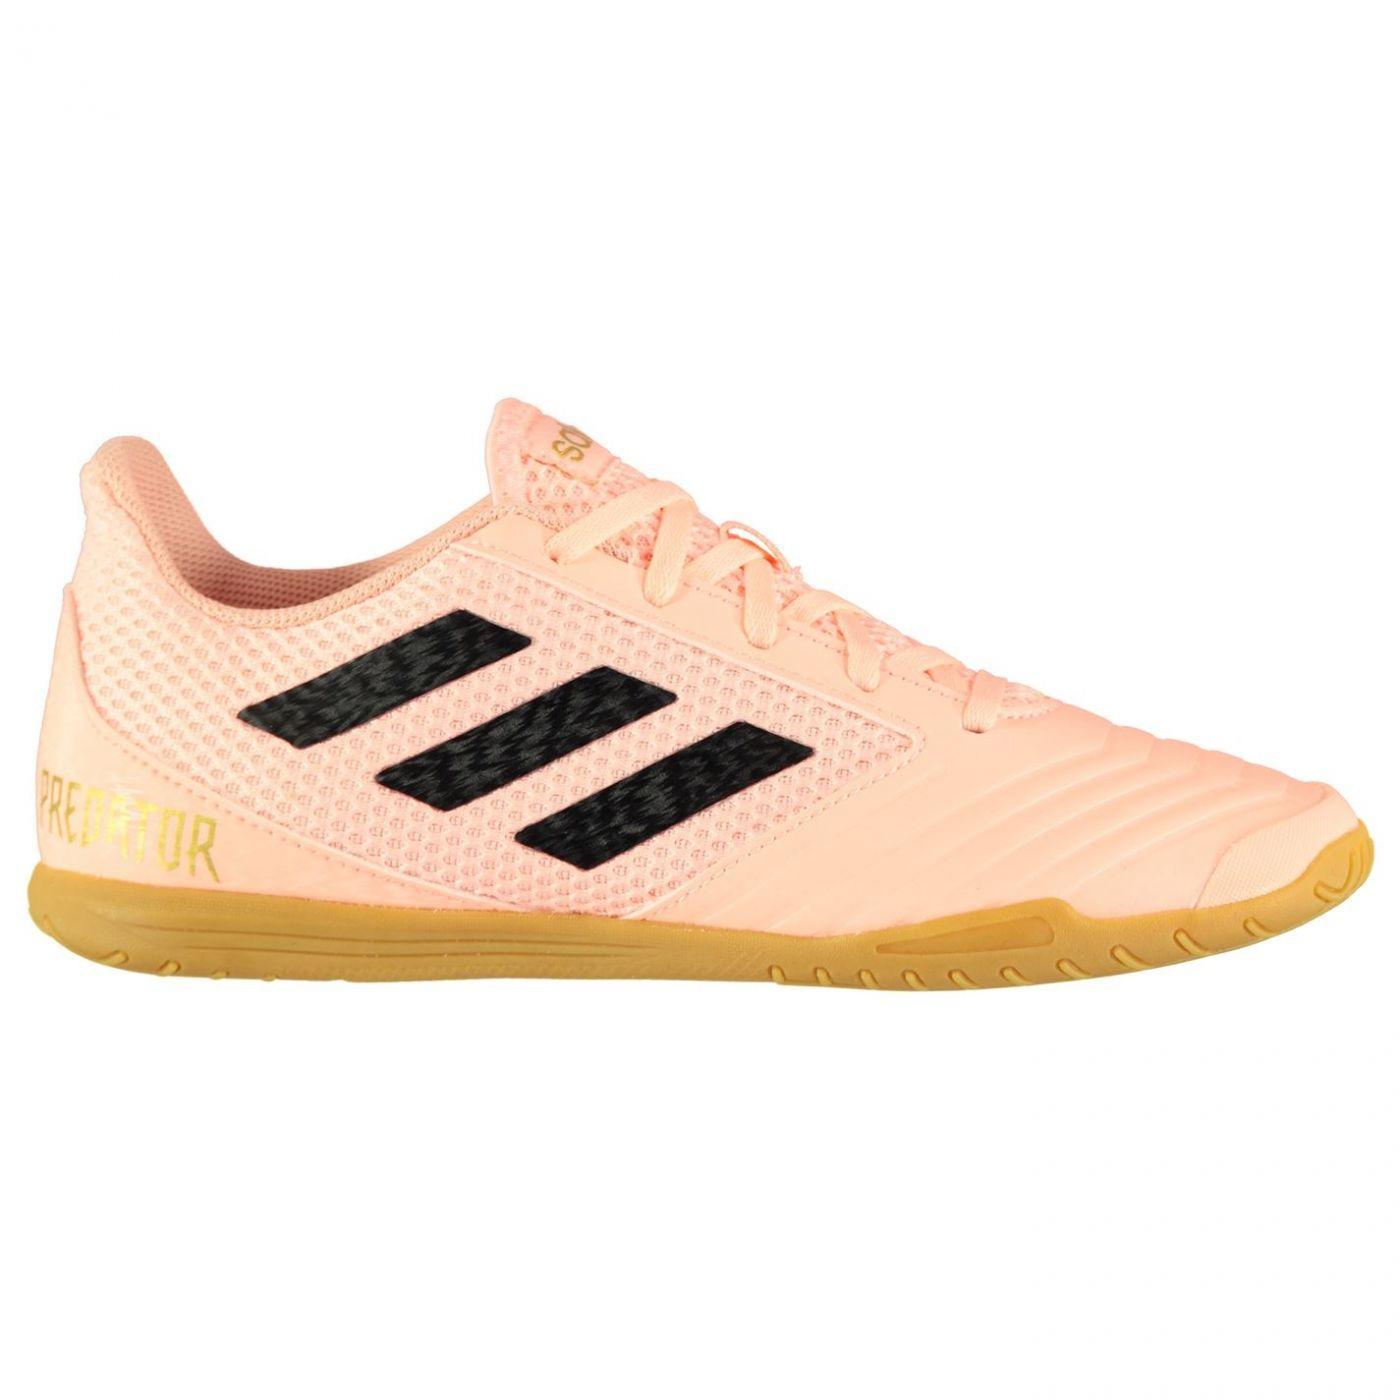 Adidas Predator Tango 18.4 Sala Indoor Football Trainers